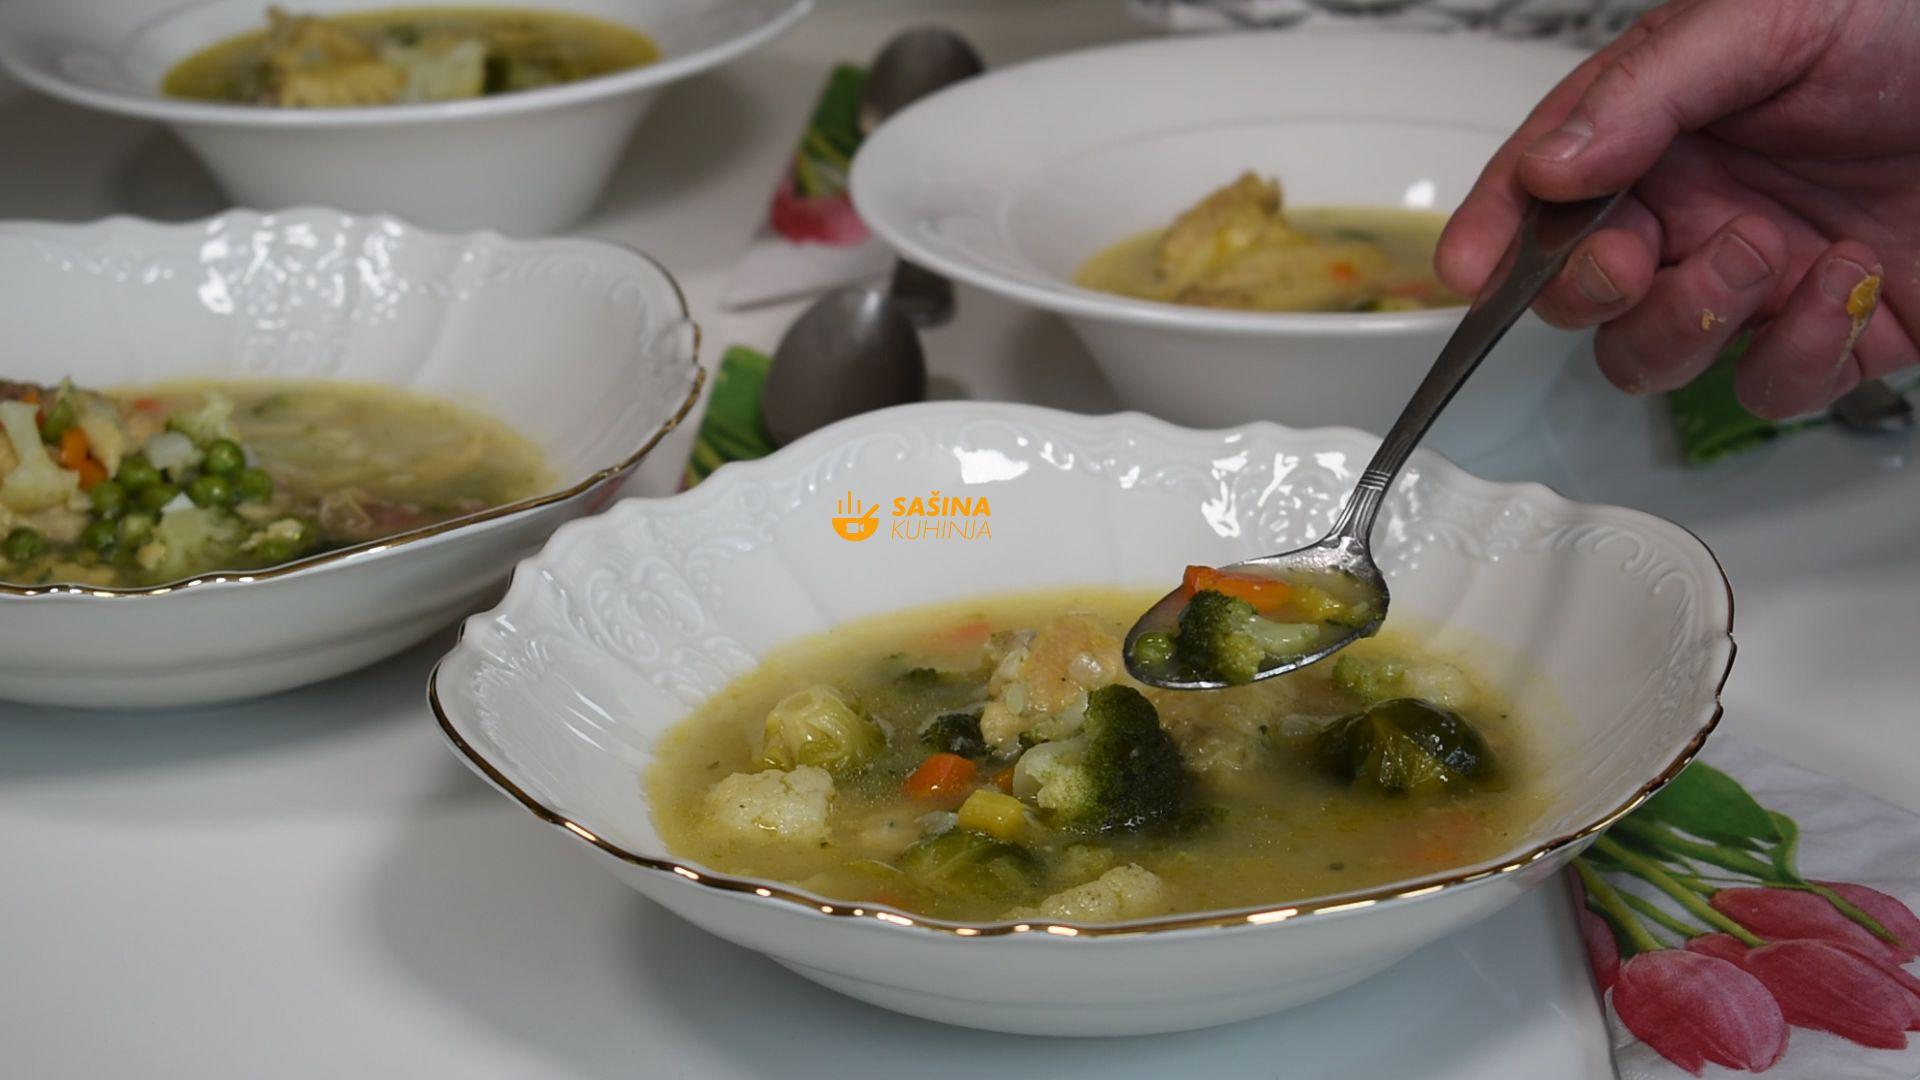 varivo sa piletinom i hrpom povrća noklice grašak recept